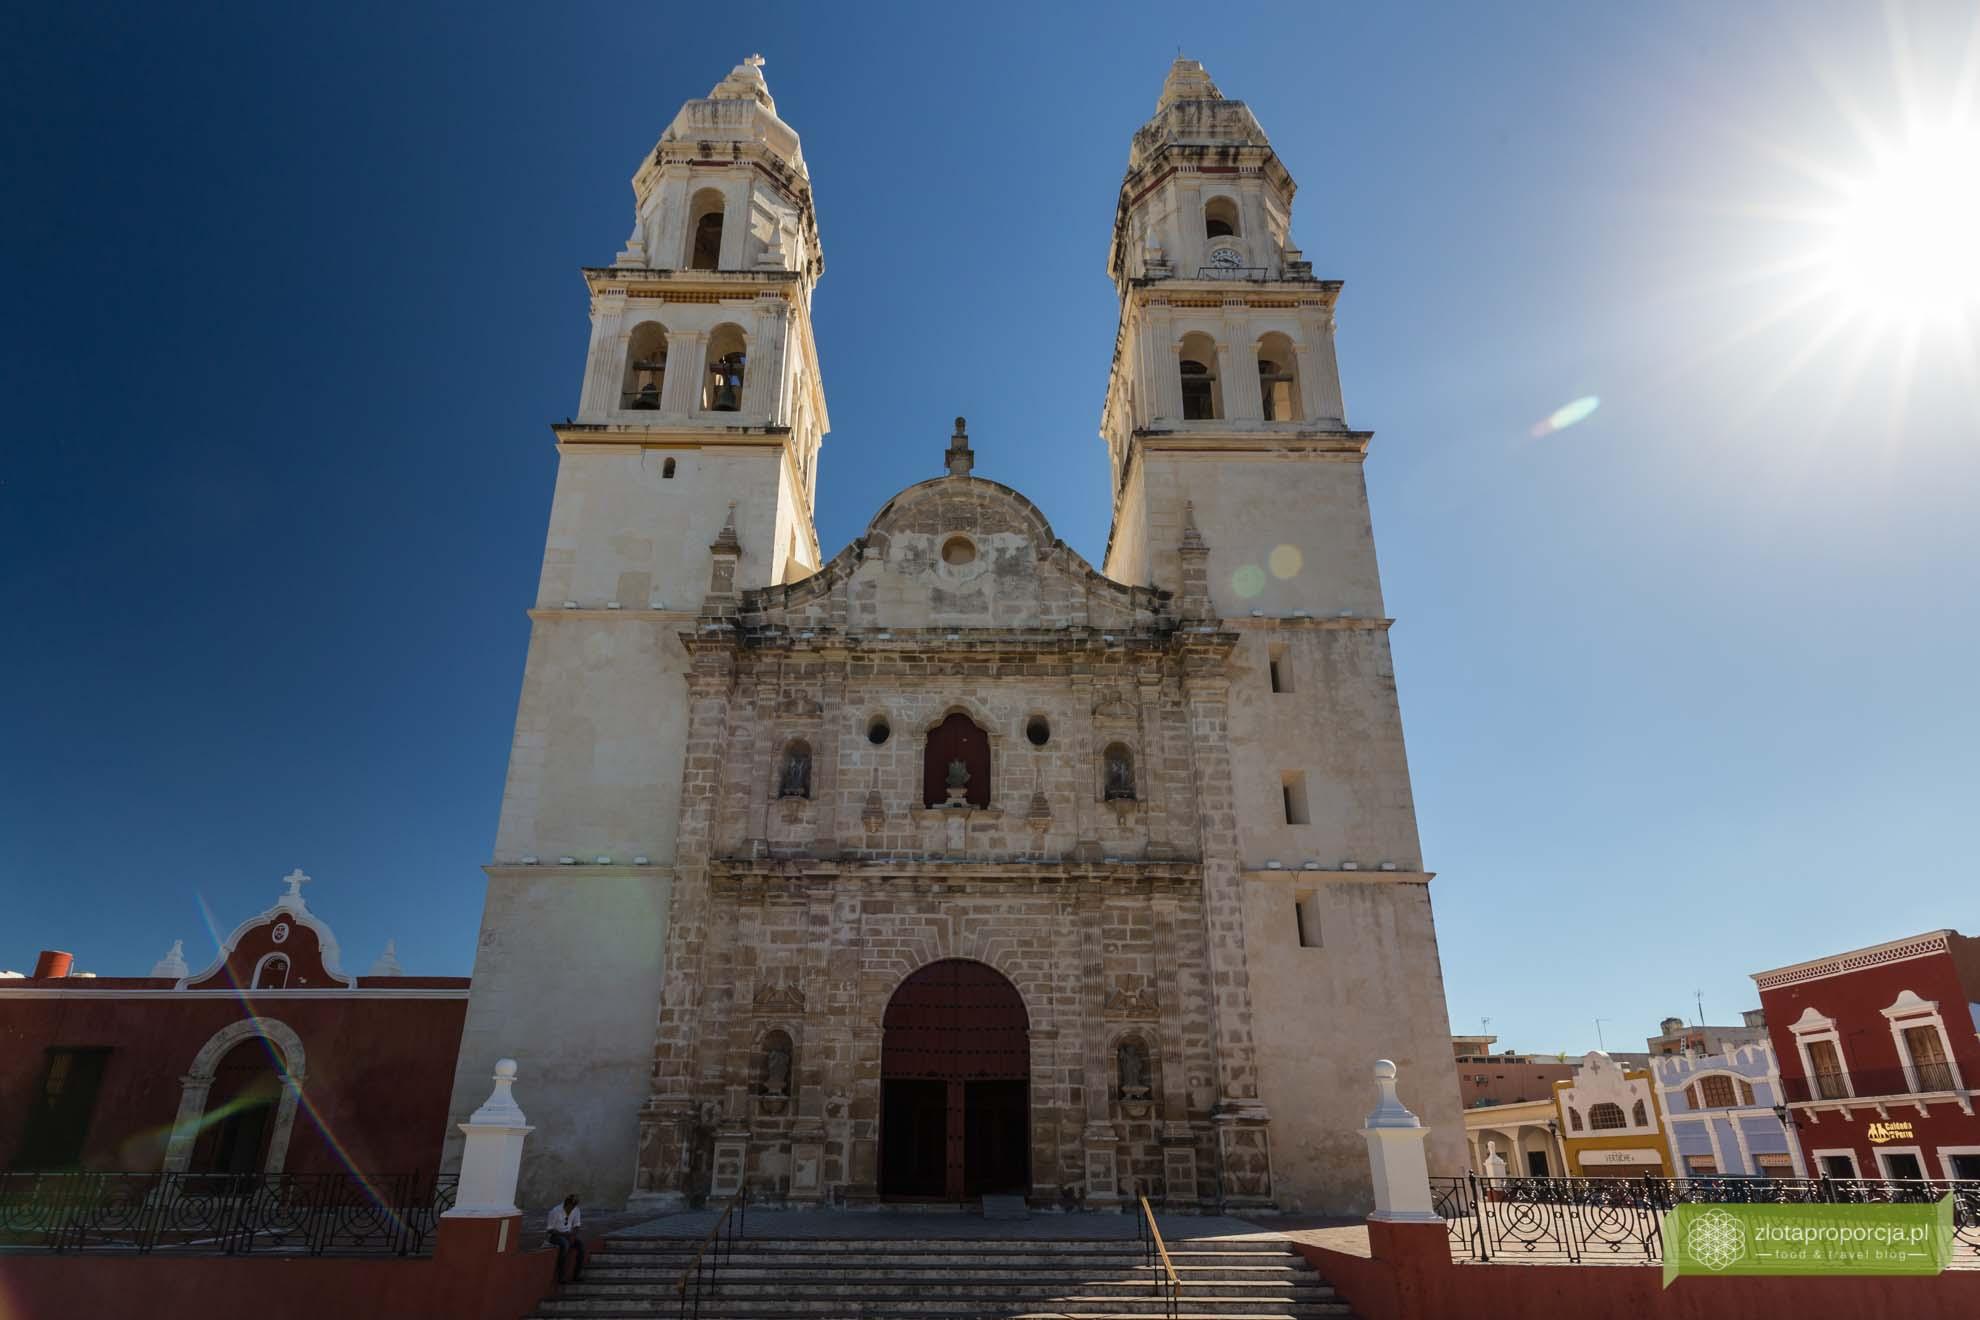 Campeche; Jukatan; Meksyk; starówka Campeche; Campeche Unesco, Meksyk Unesco; katedra Campeche; katedra w Campeche